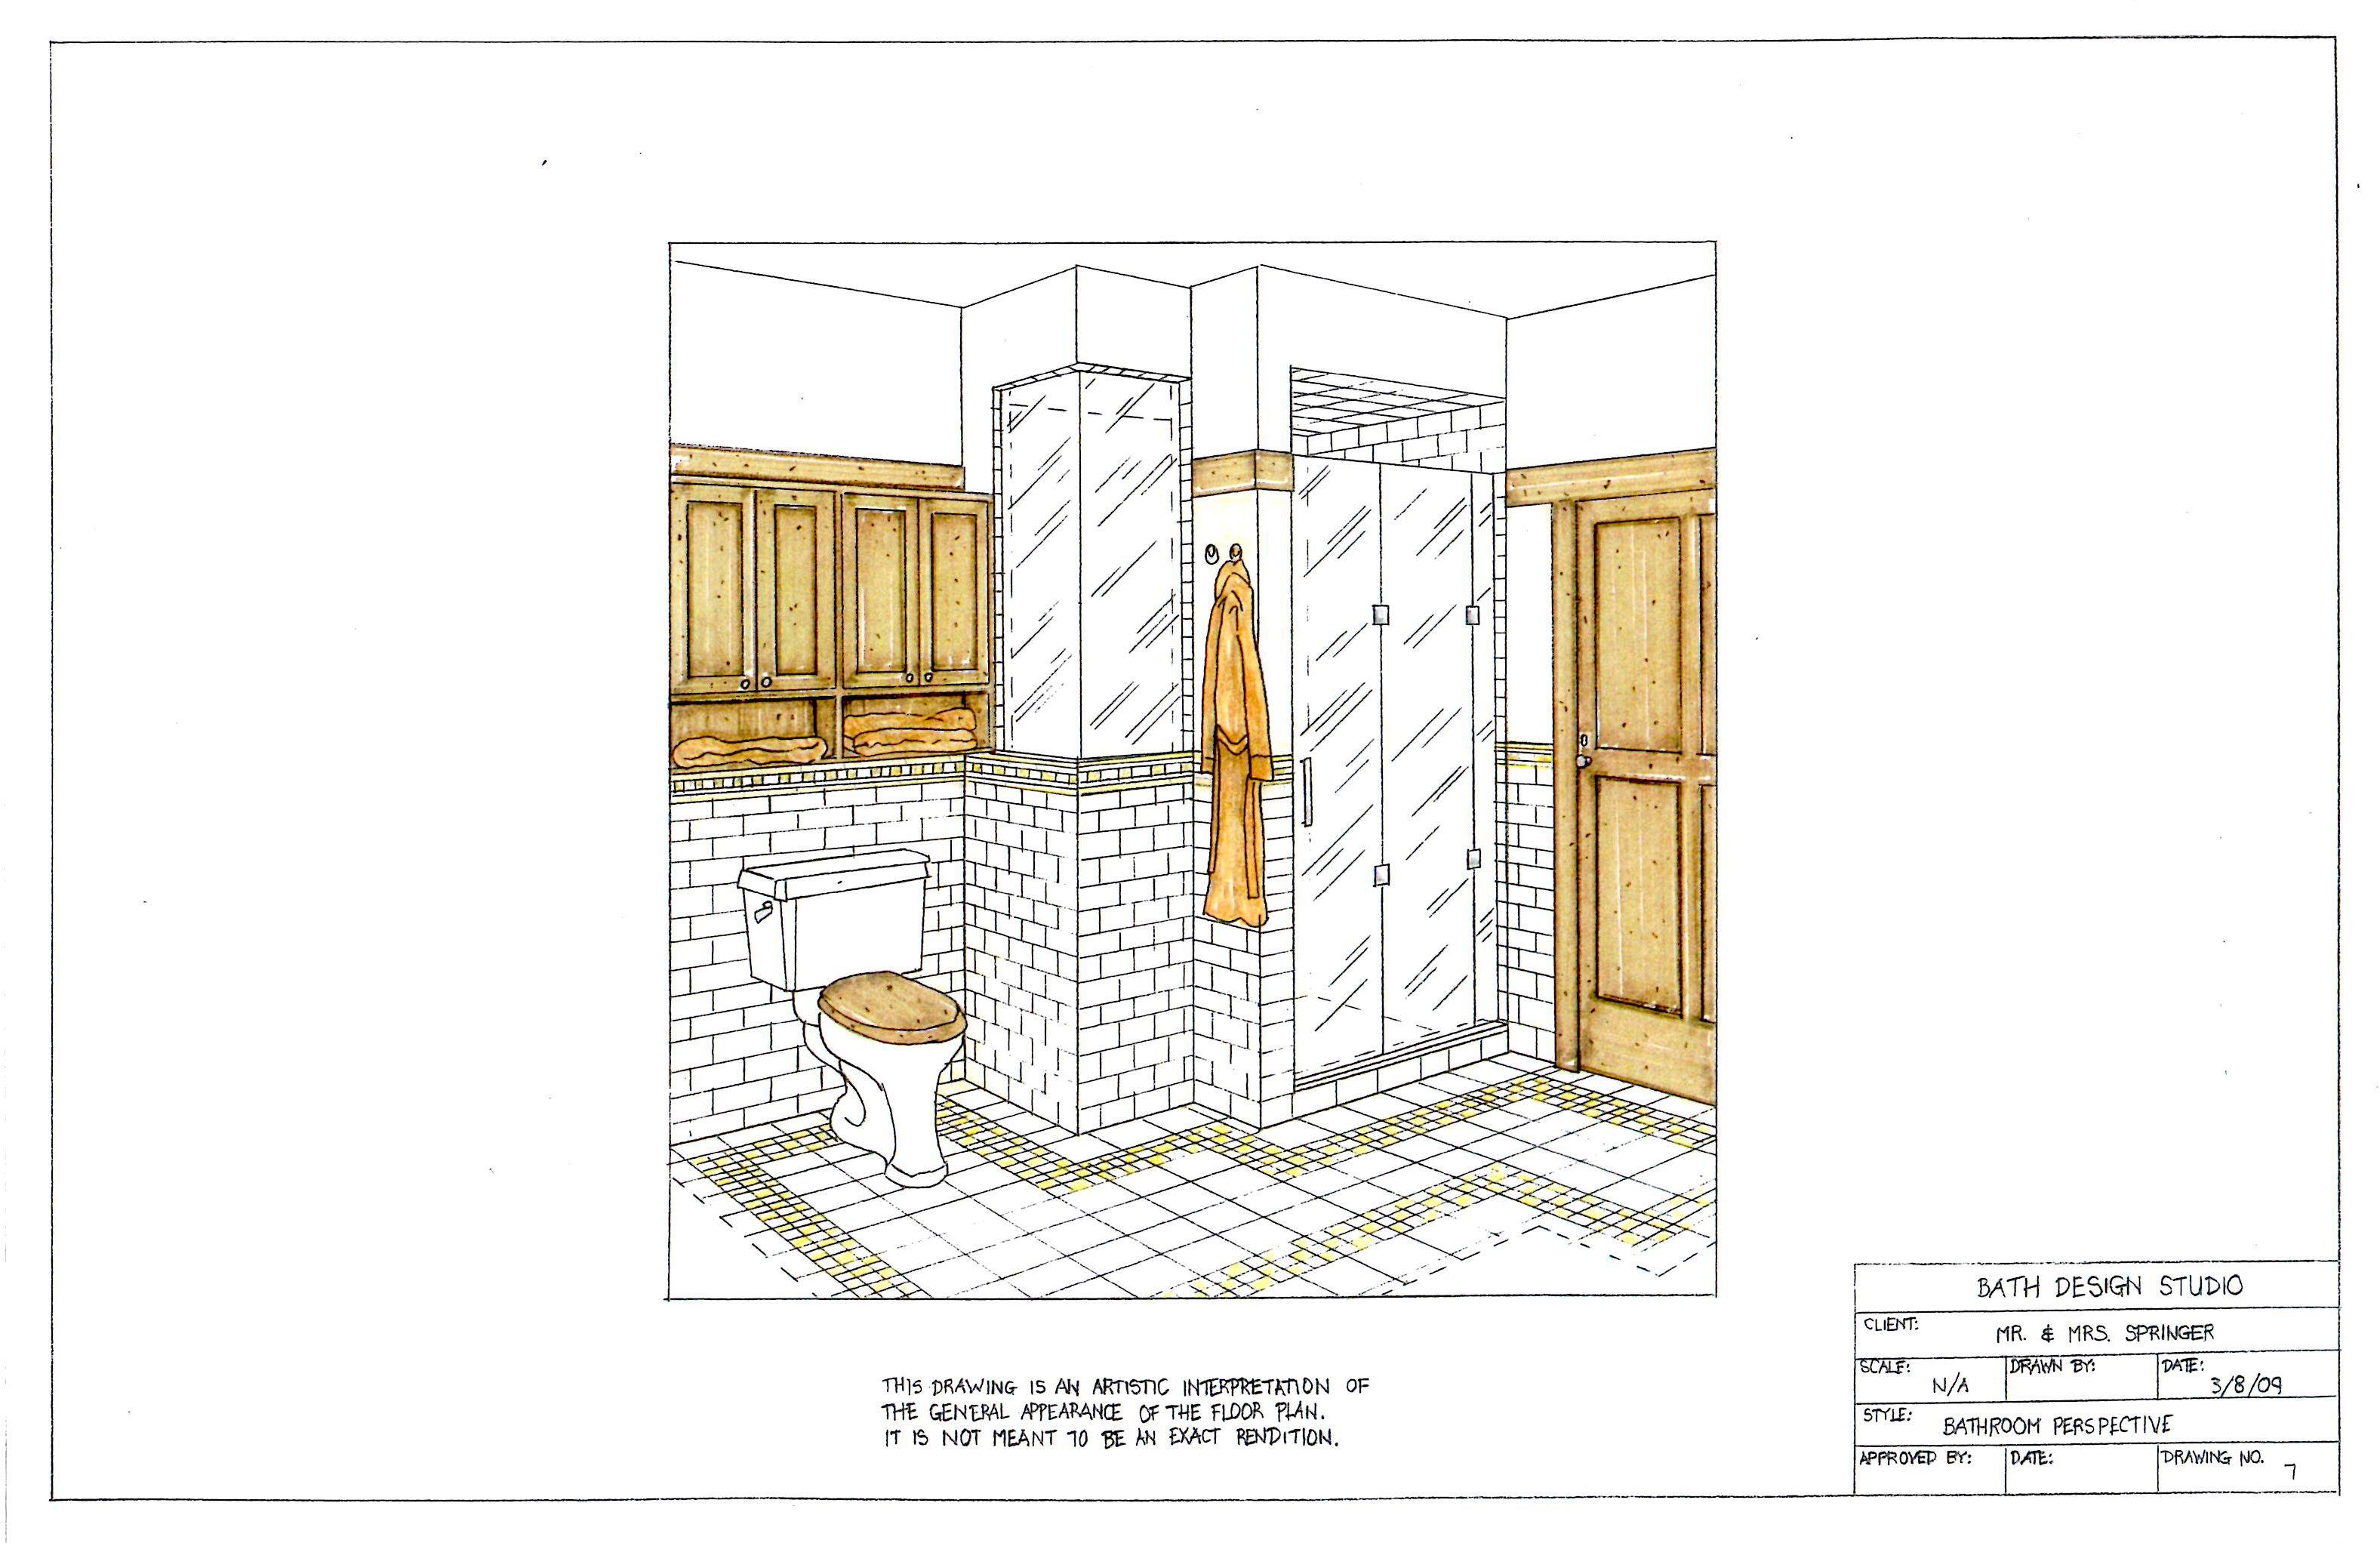 Image Result For Remodeling Bathroom Hand Rendering Drawings